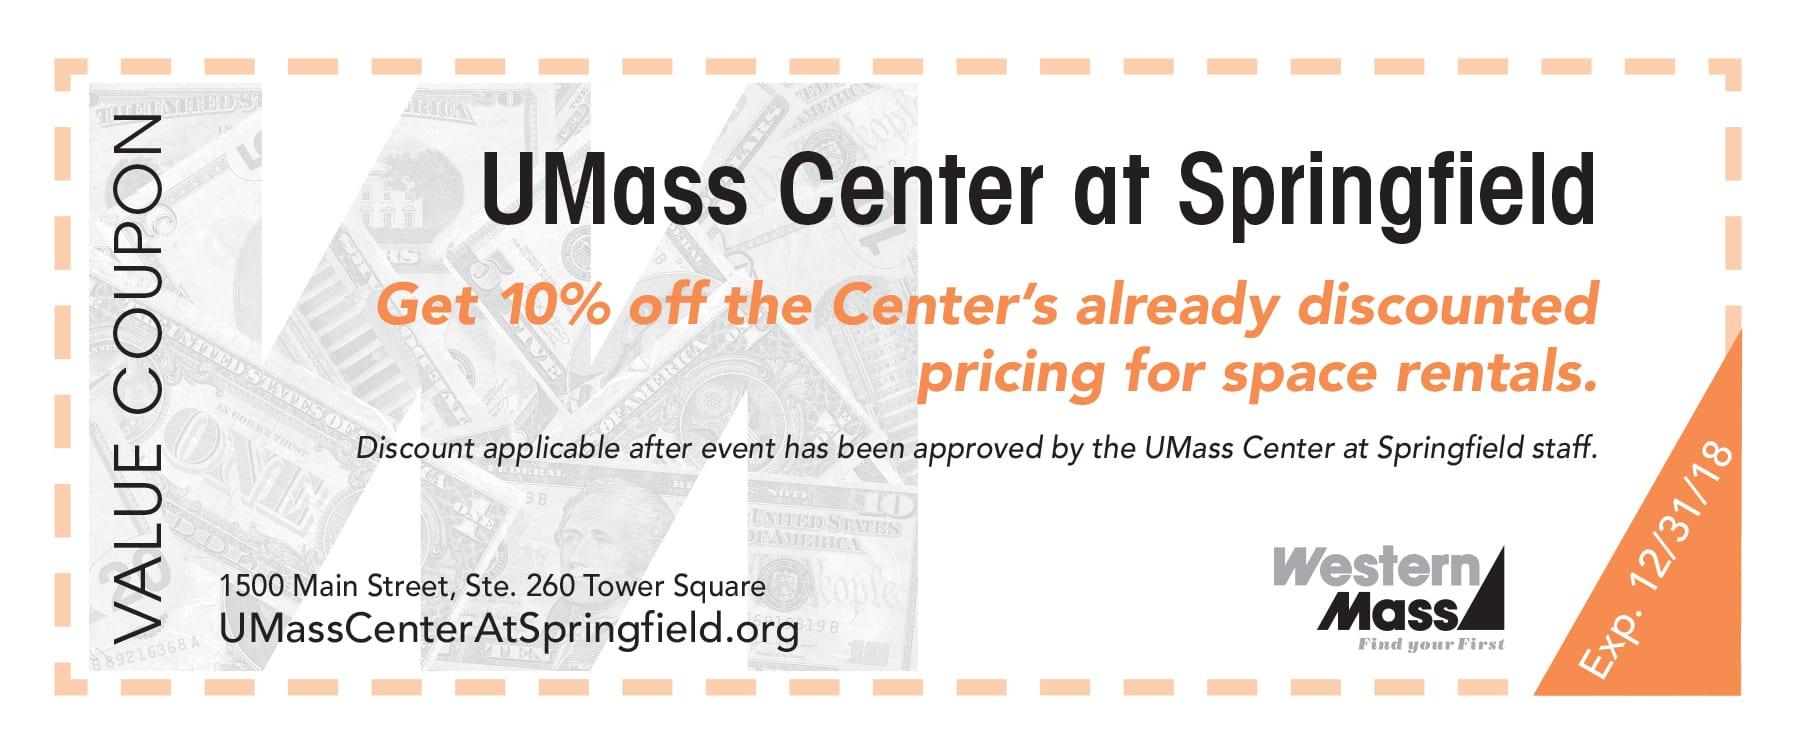 UMass Center at Springfield